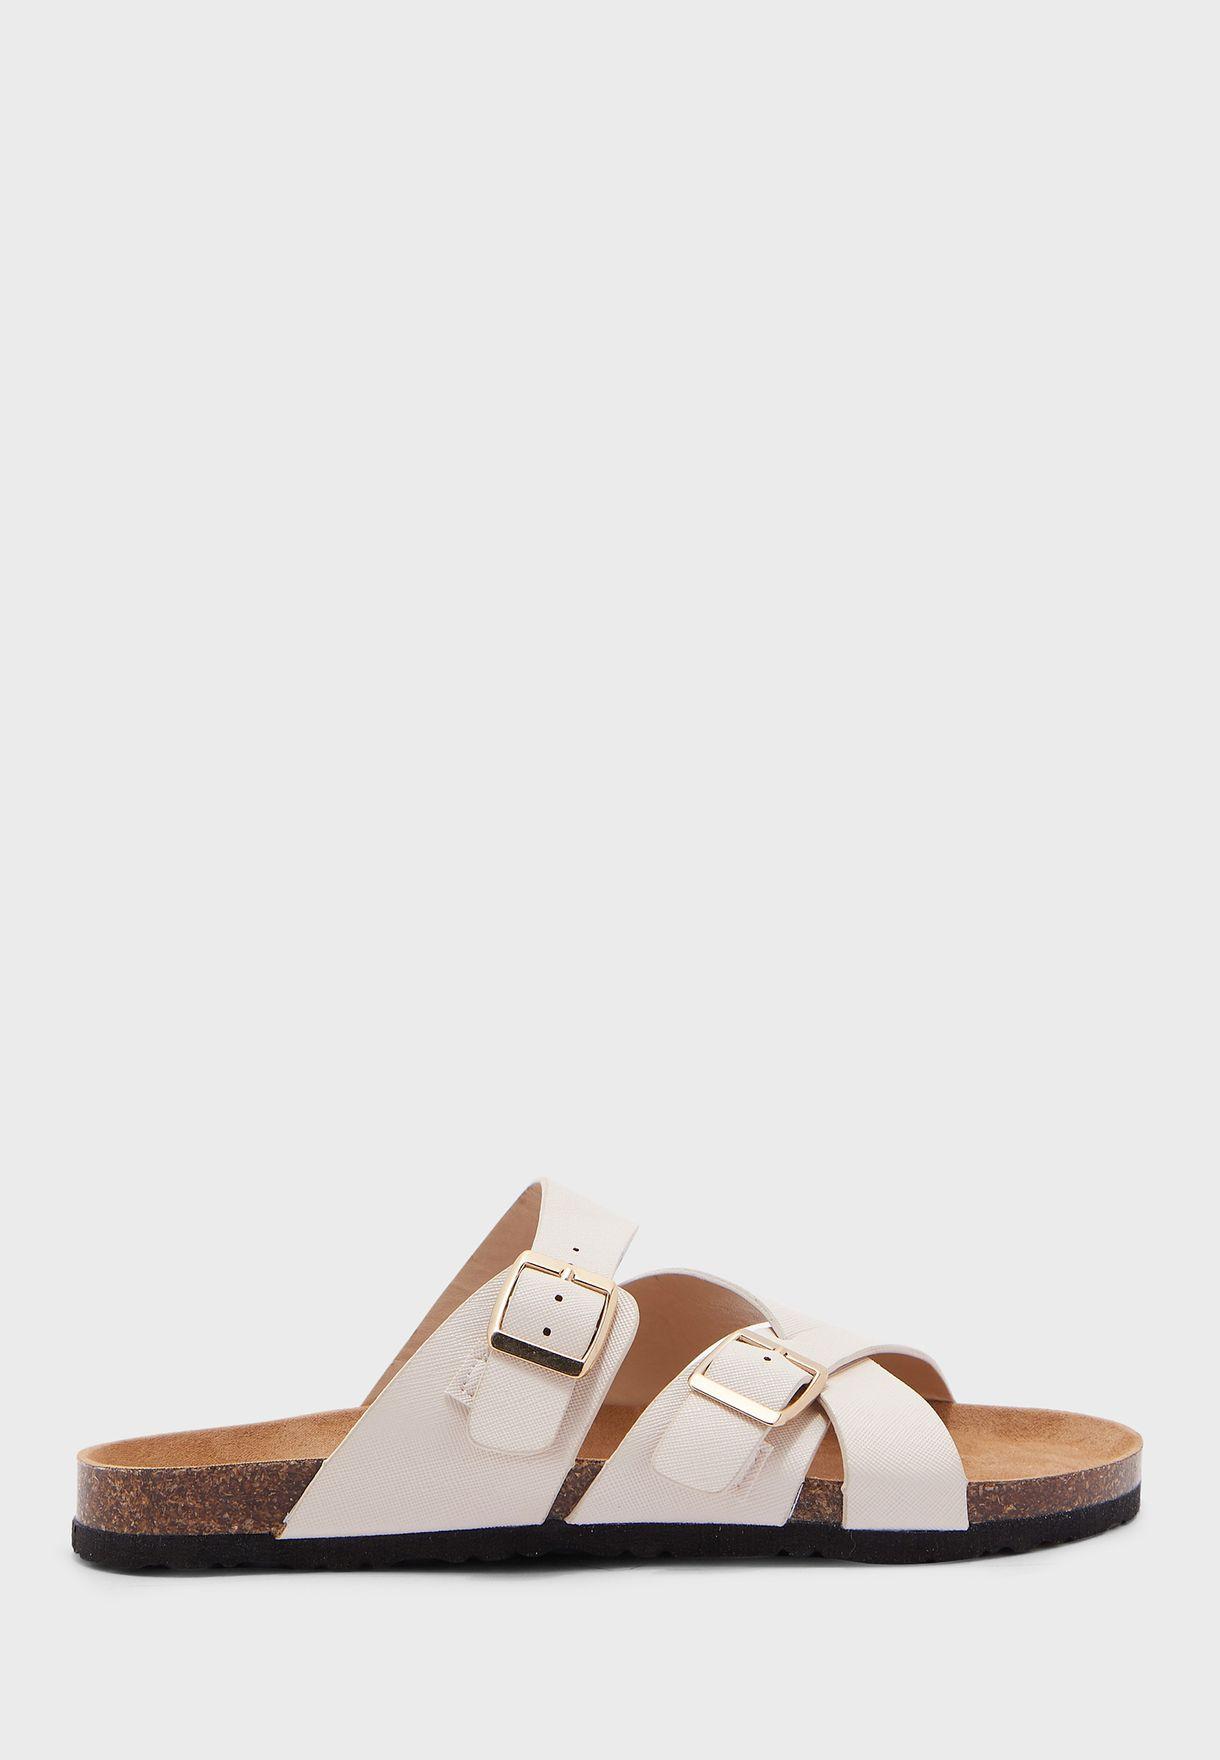 Wide Fit Faye Wedge Sandal